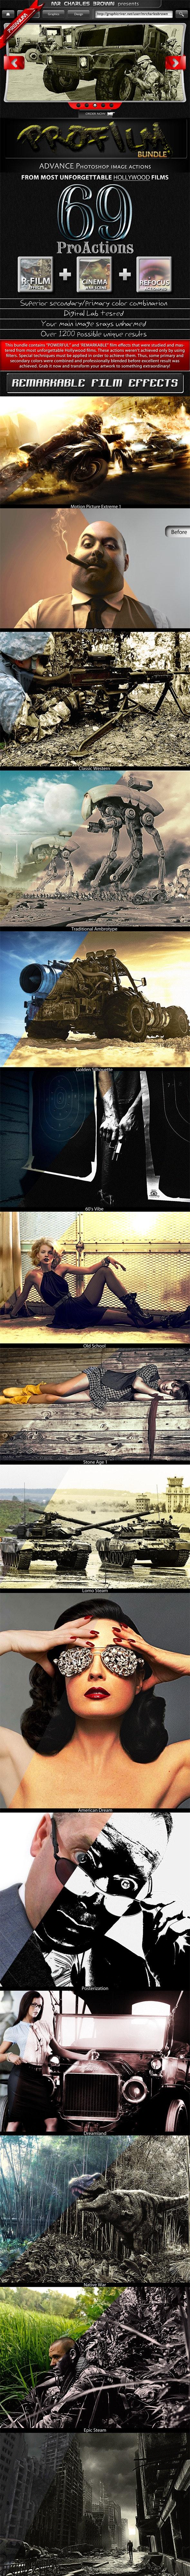 Pro Film Action Bundle - Photoshop Add-ons